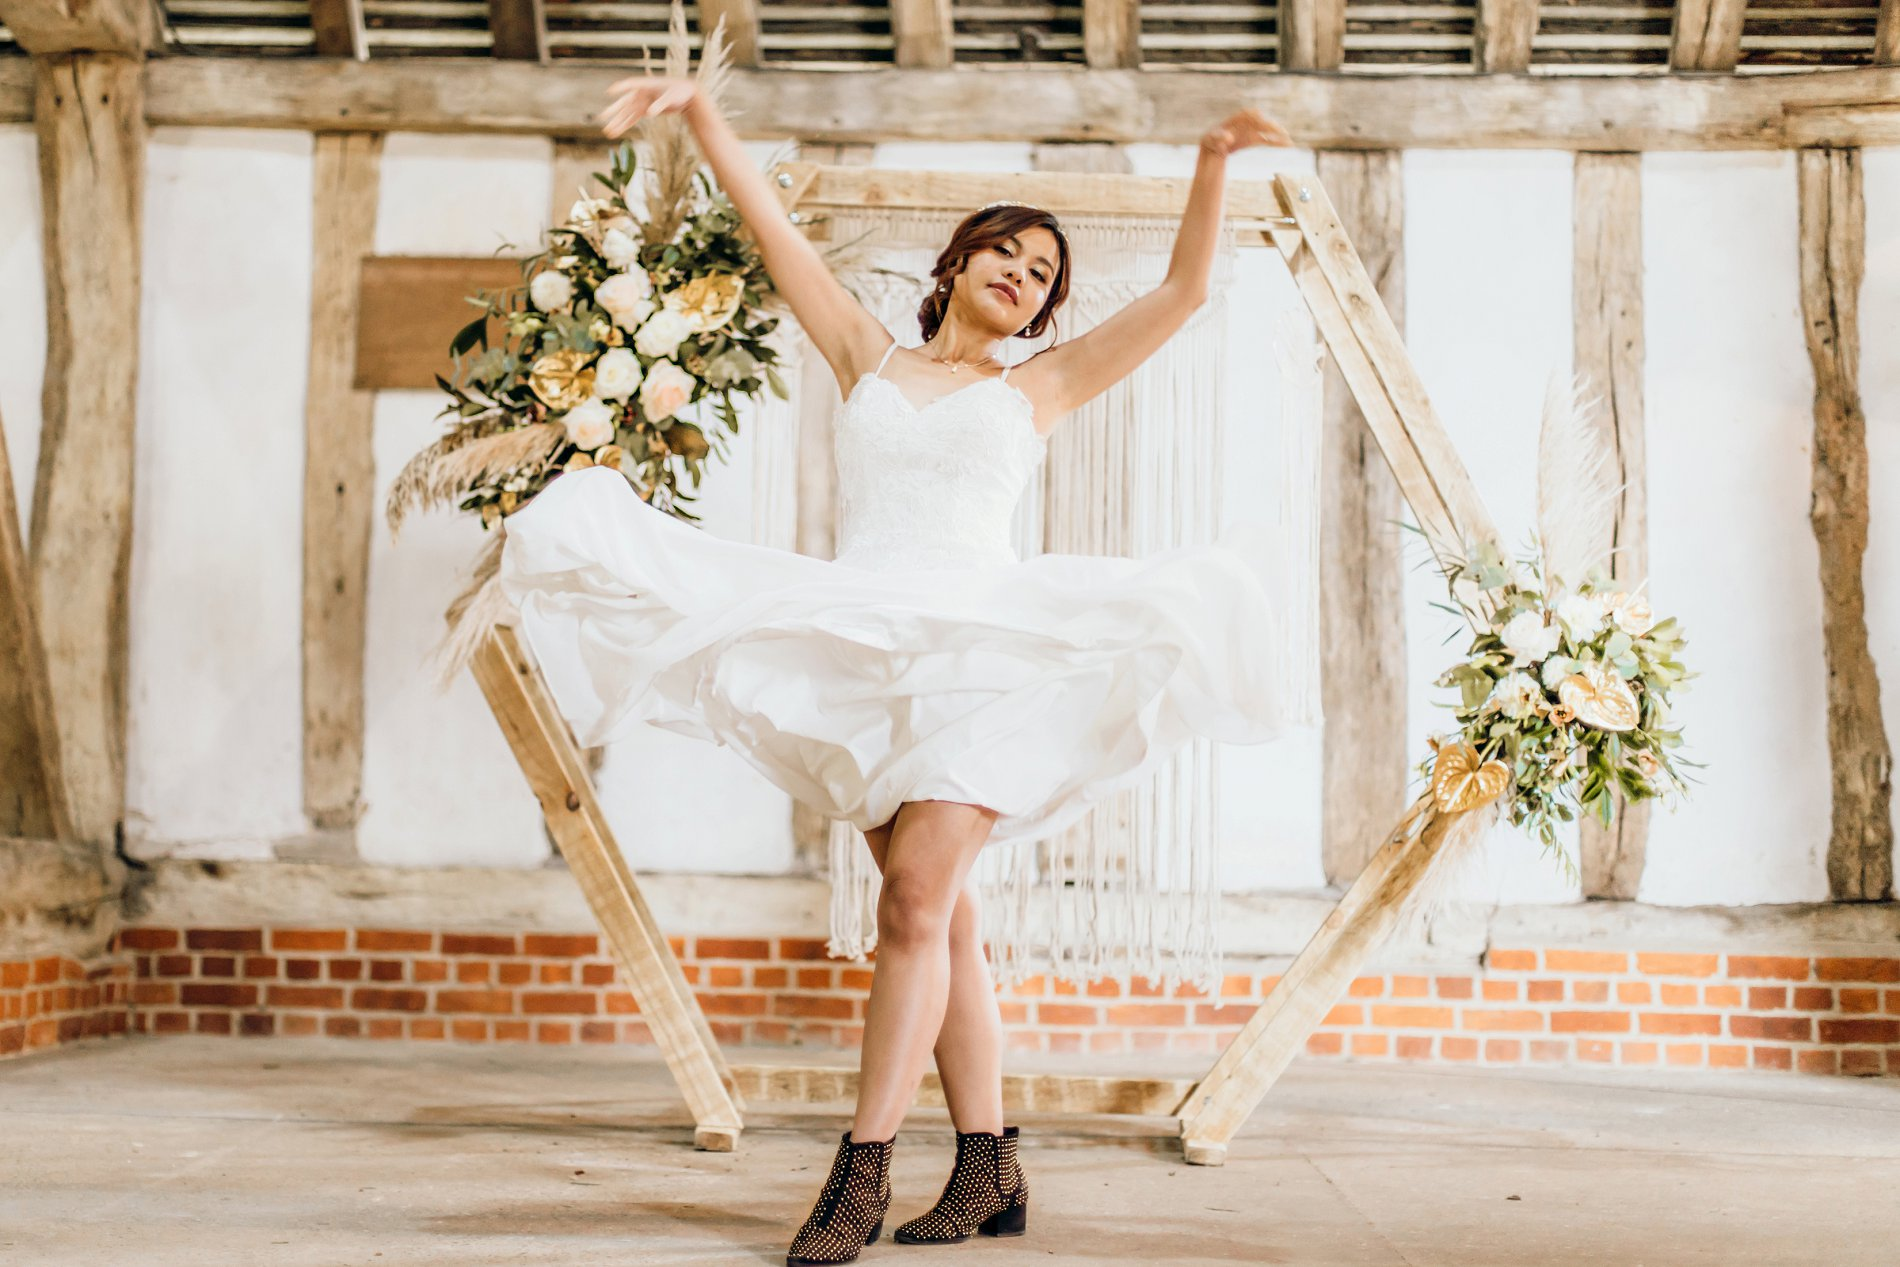 A Golden Boho Wedding Shoot at Cressing Temple Barns (c) Kate Boston Photography (27)